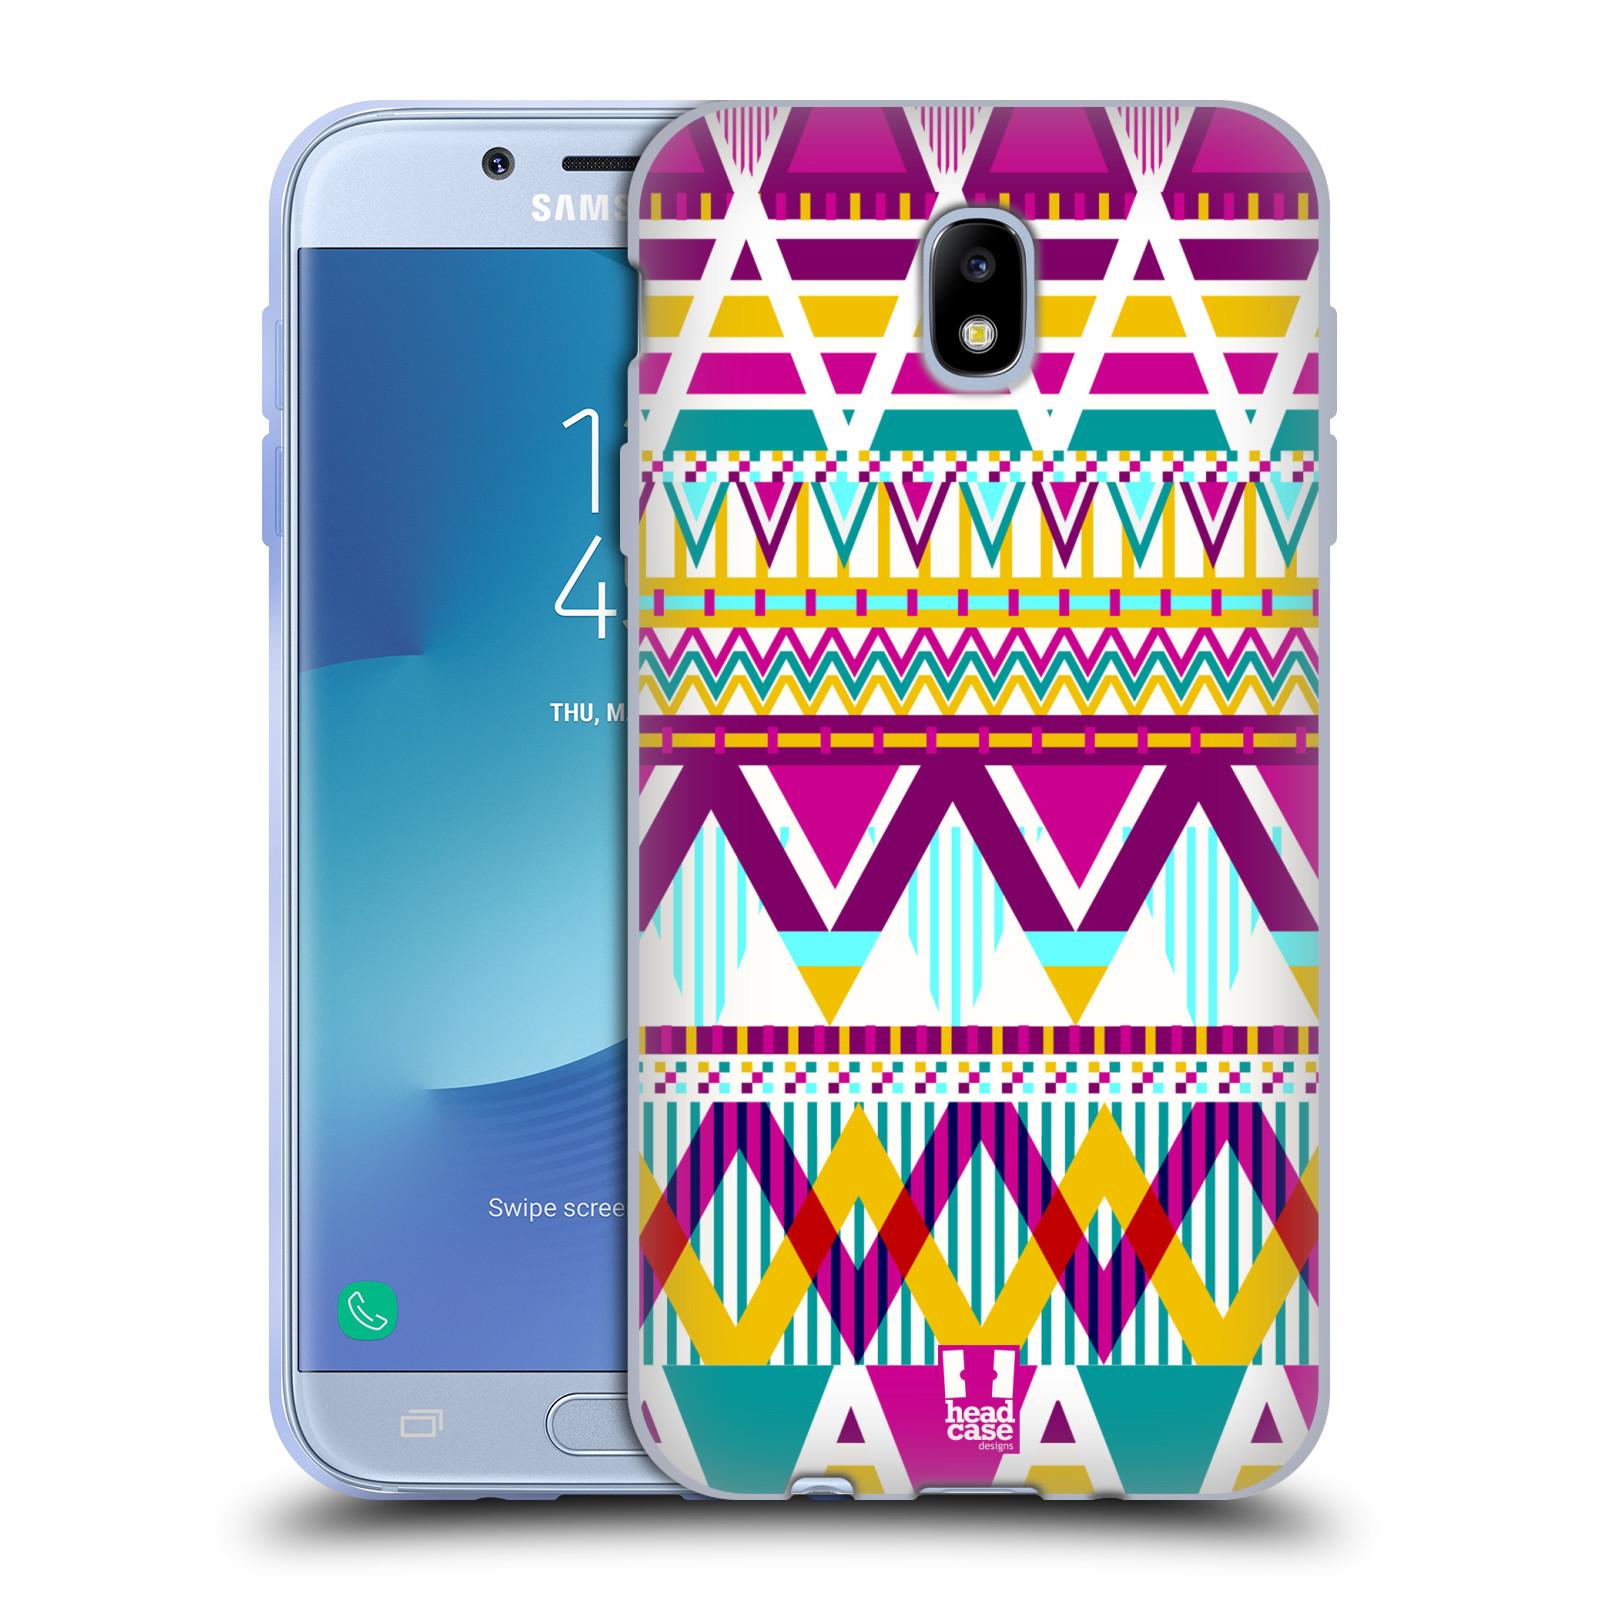 Silikonové pouzdro na mobil Samsung Galaxy J7 (2017) - Head Case - AZTEC SUGARED